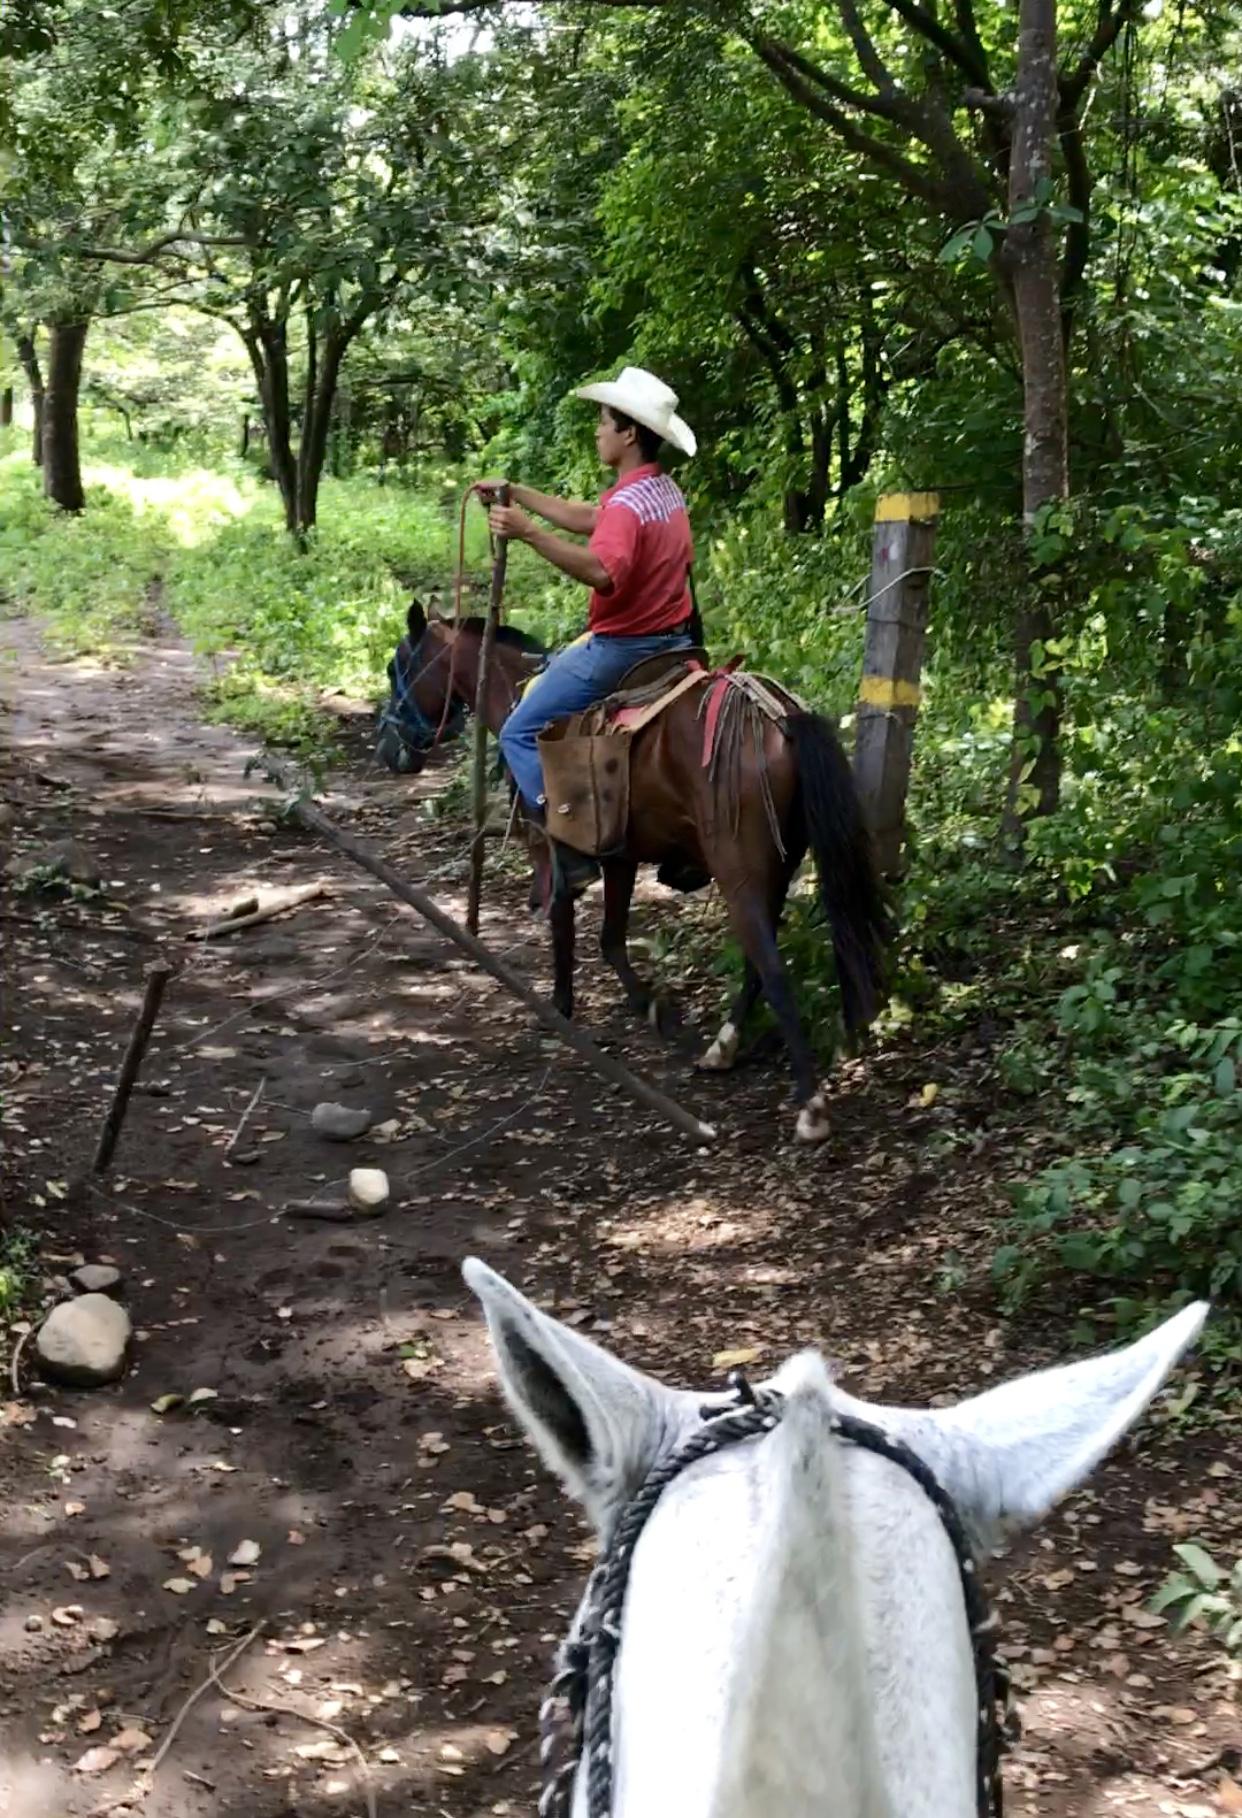 horseback riding rincon de la vieja, liberia, costa rica, cowboy, horseback riding